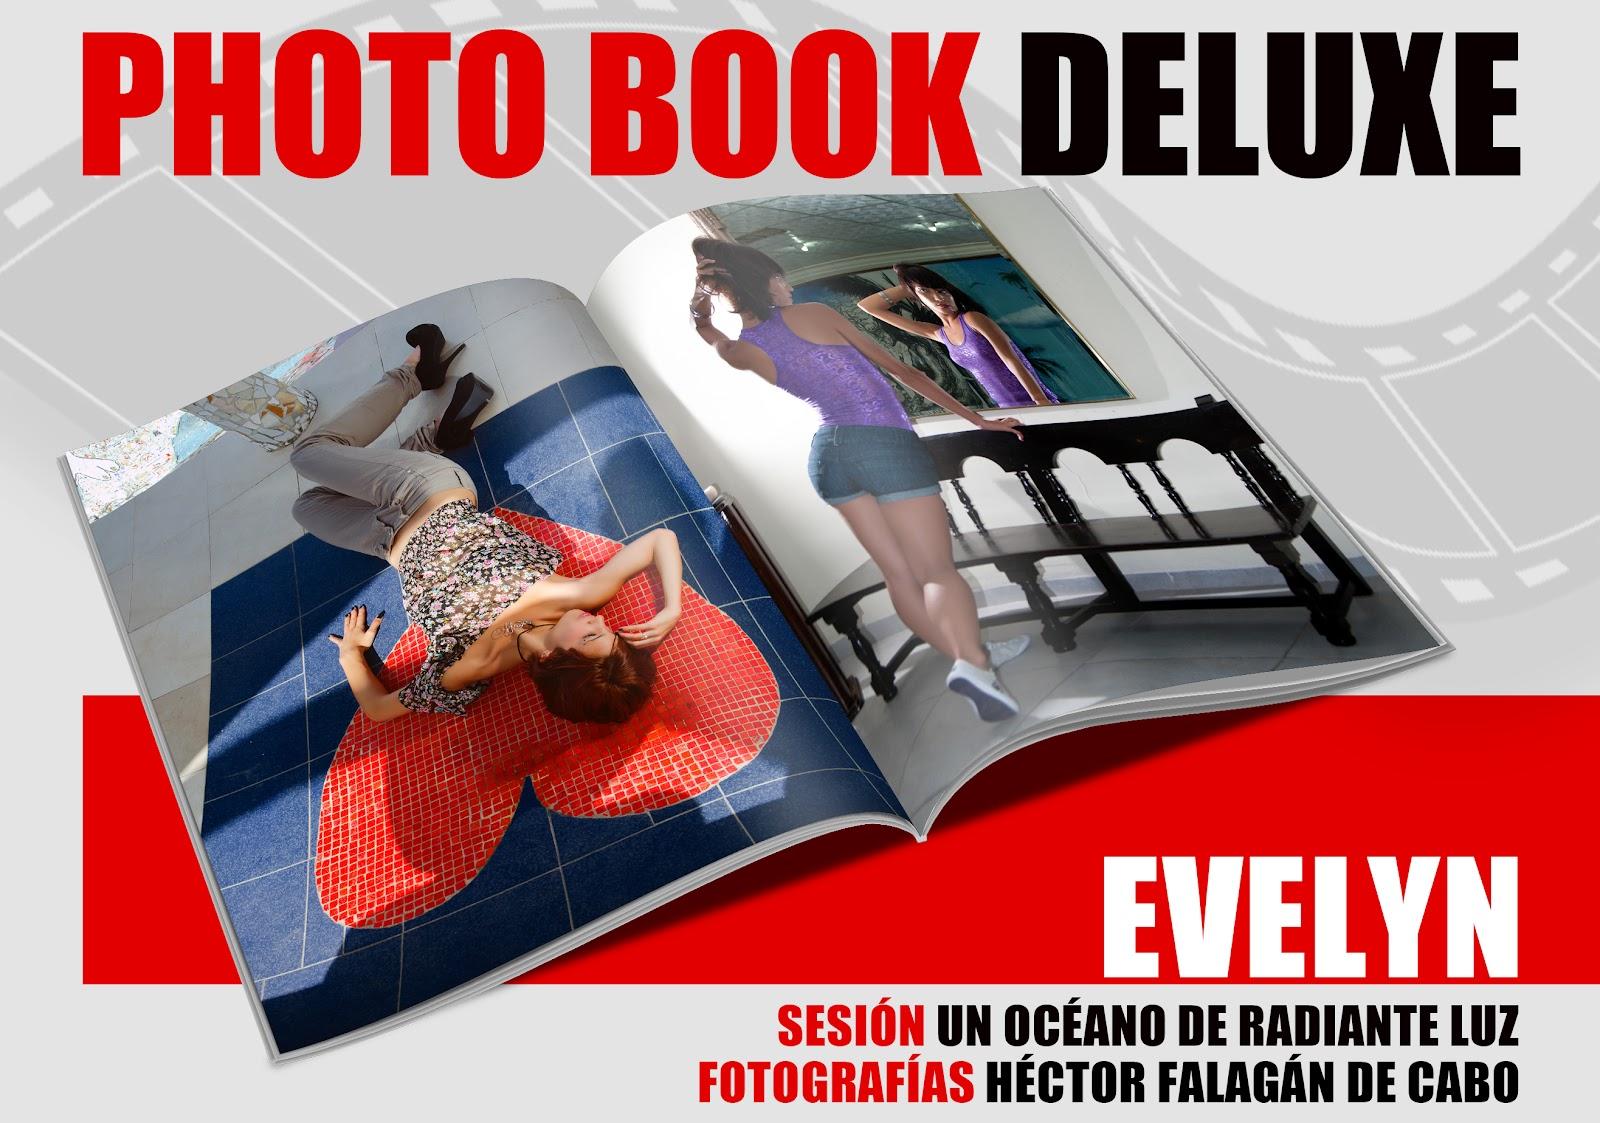 Fotografía Modelos Habana. Evelyn: Un océano de radiante luz. Héctor Falagán De Cabo | hfilms & photography. La Habana, Cuba.